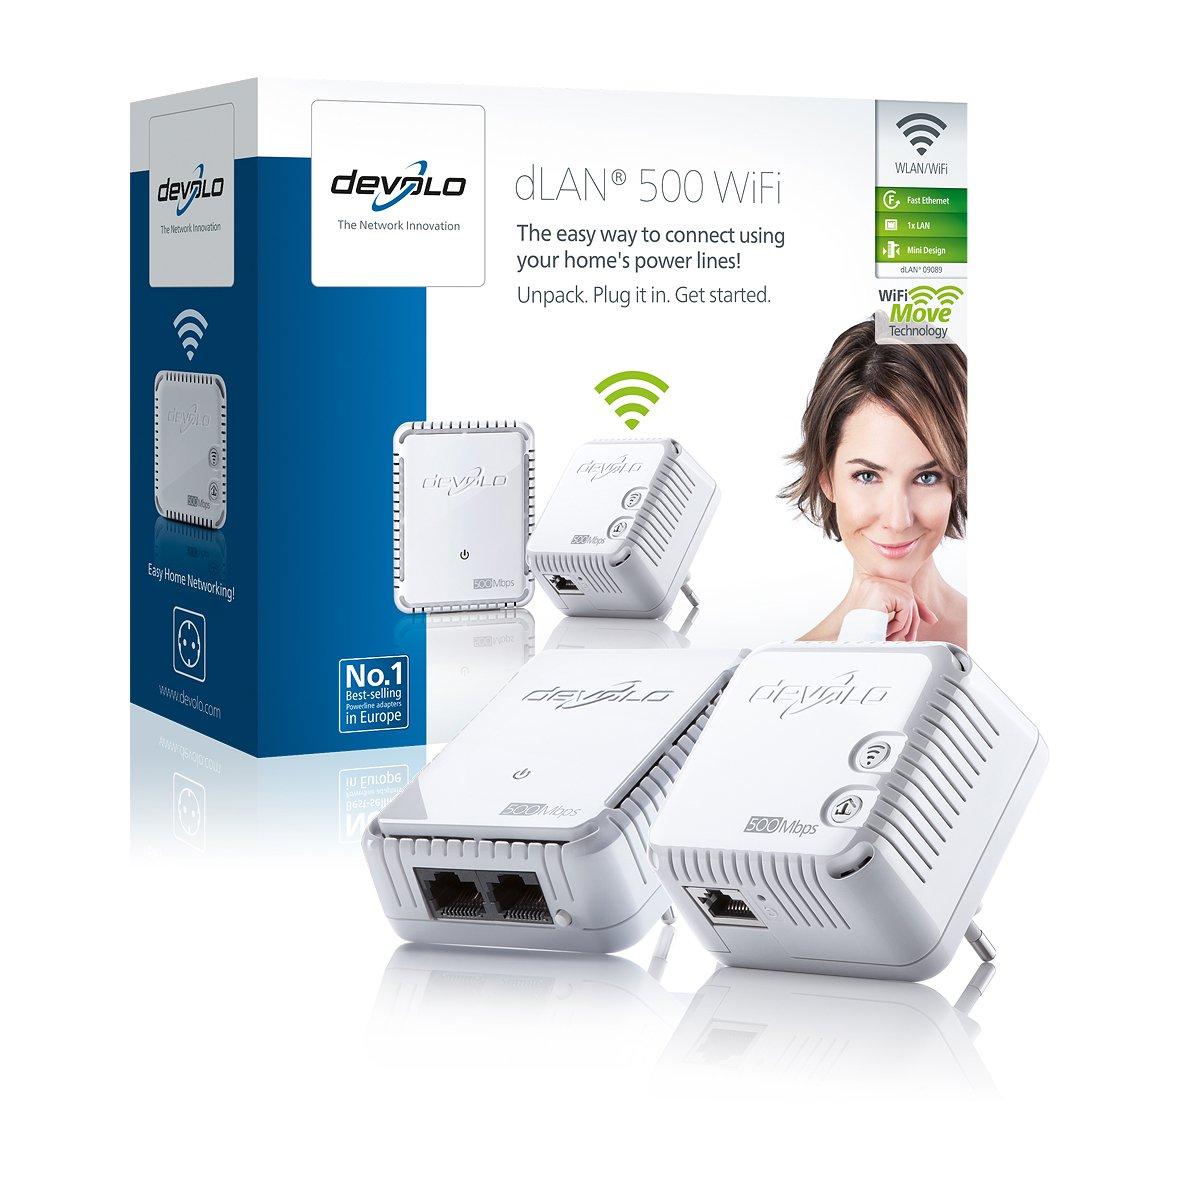 devolo dLAN 500 WiFi Starter Kit (500